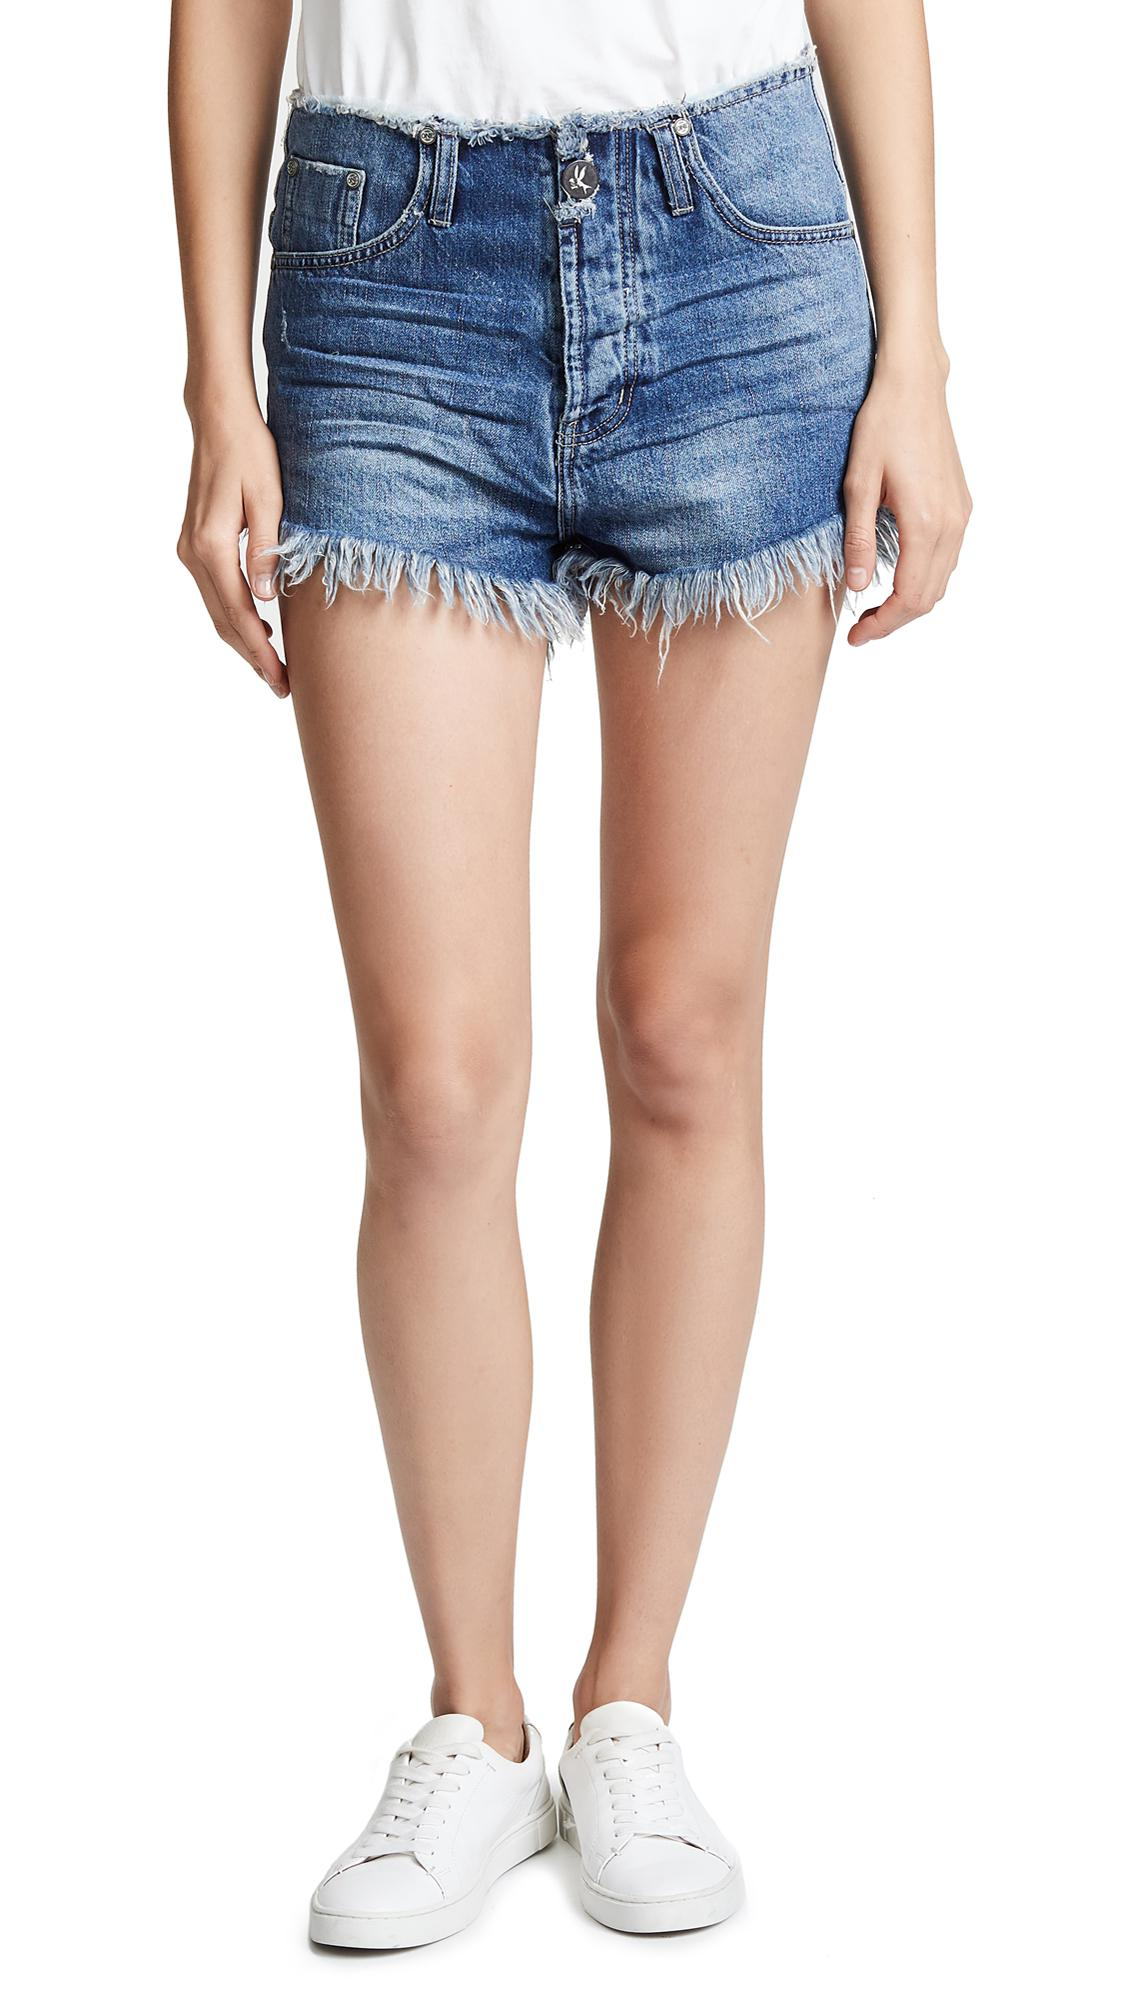 dccf85b189 One Teaspoon Oxford Outlaws Mid Length Denim Shorts in Blue - Lyst